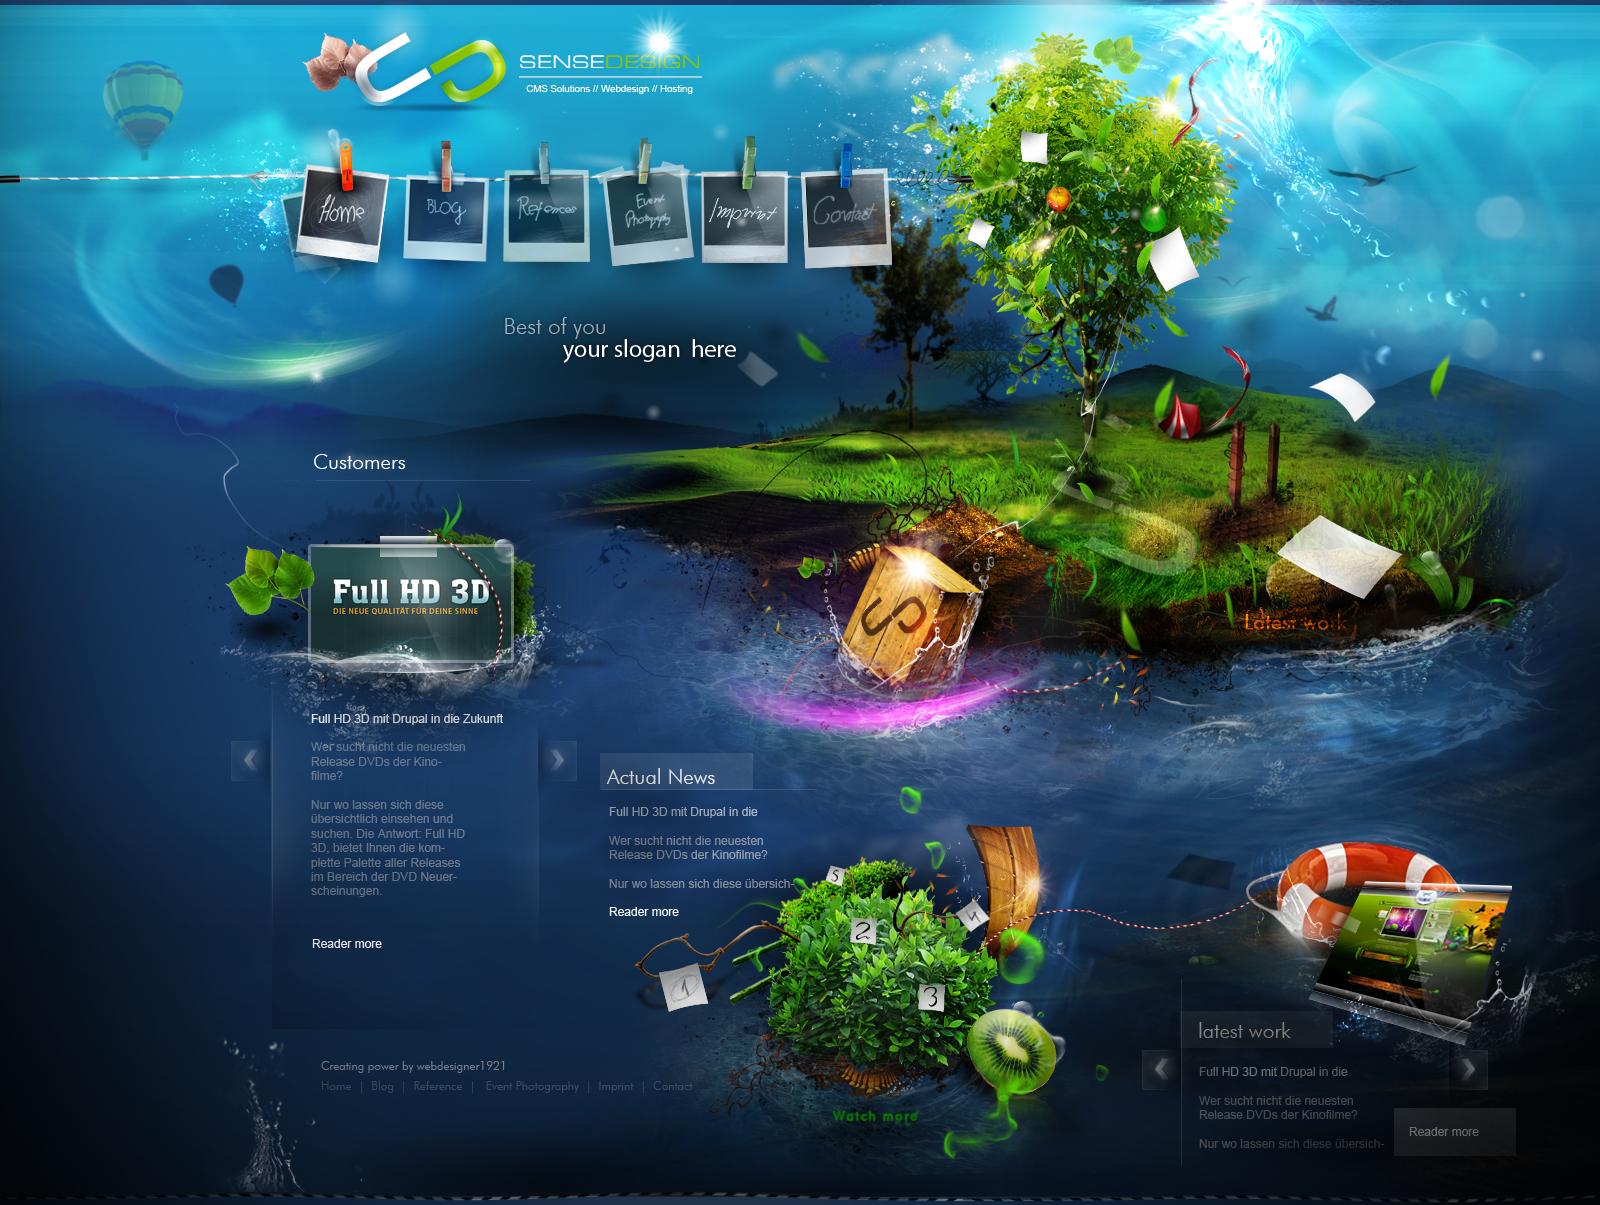 sense-design ver 1 by webdesigner1921 on DeviantArt